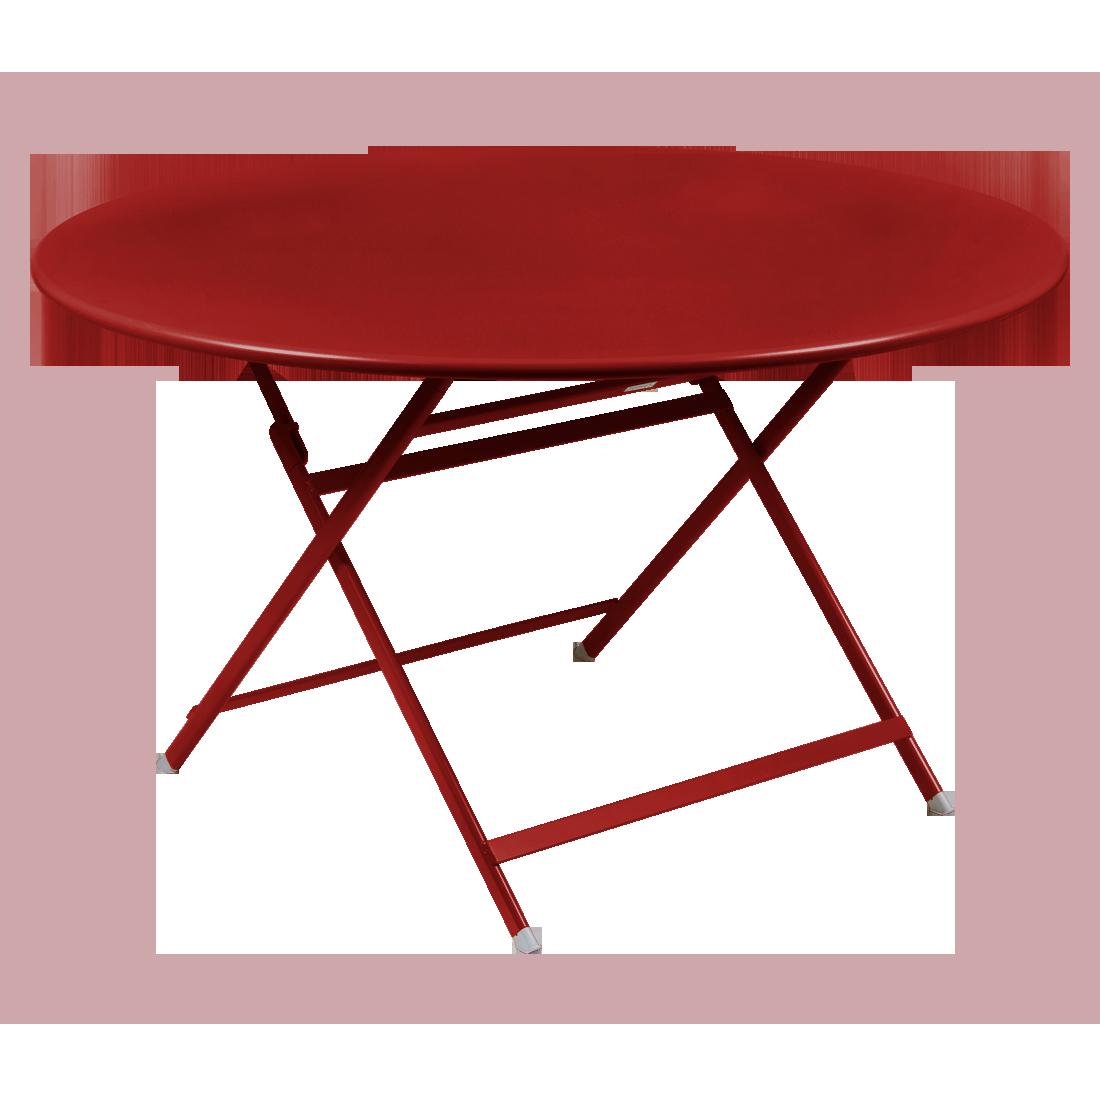 table de jardin pliante, table metal ronde, table metal 7 personnes, table de jardin rouge, table metal rouge